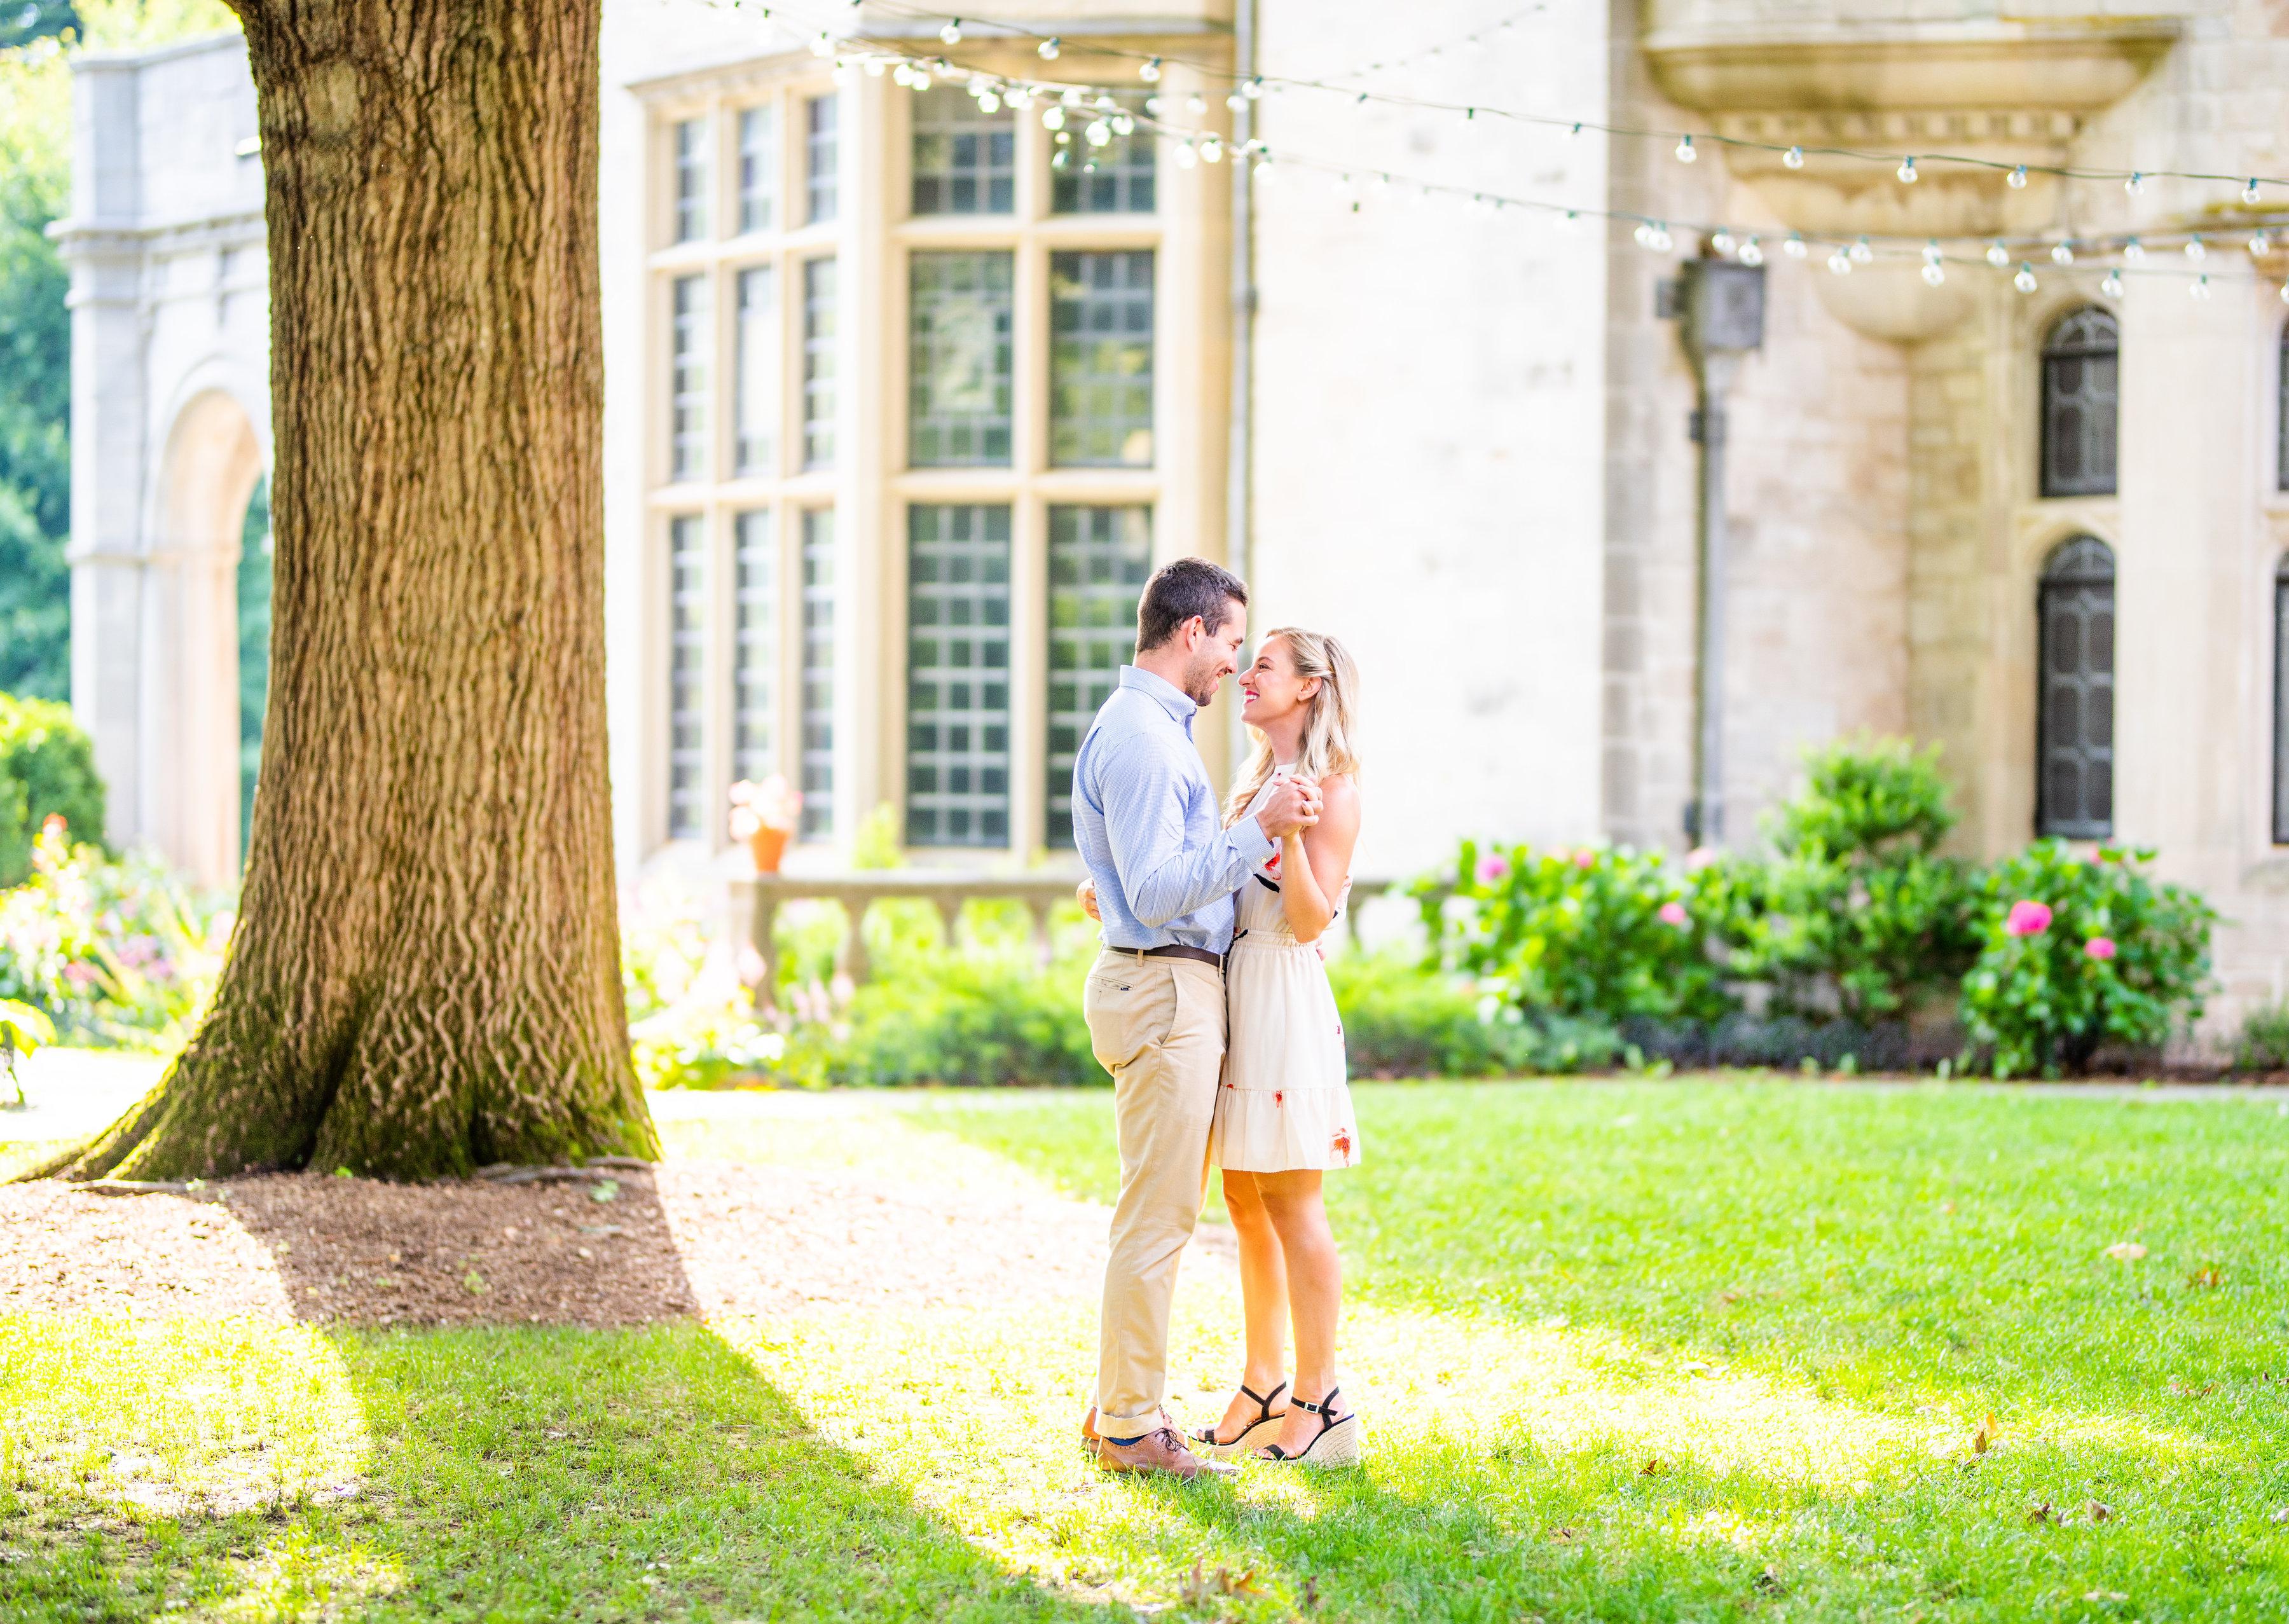 Planting Fields Arboretum Engagement Shoot | Oyster Bay Engagement Shoot | Long Island Wedding Photographer25